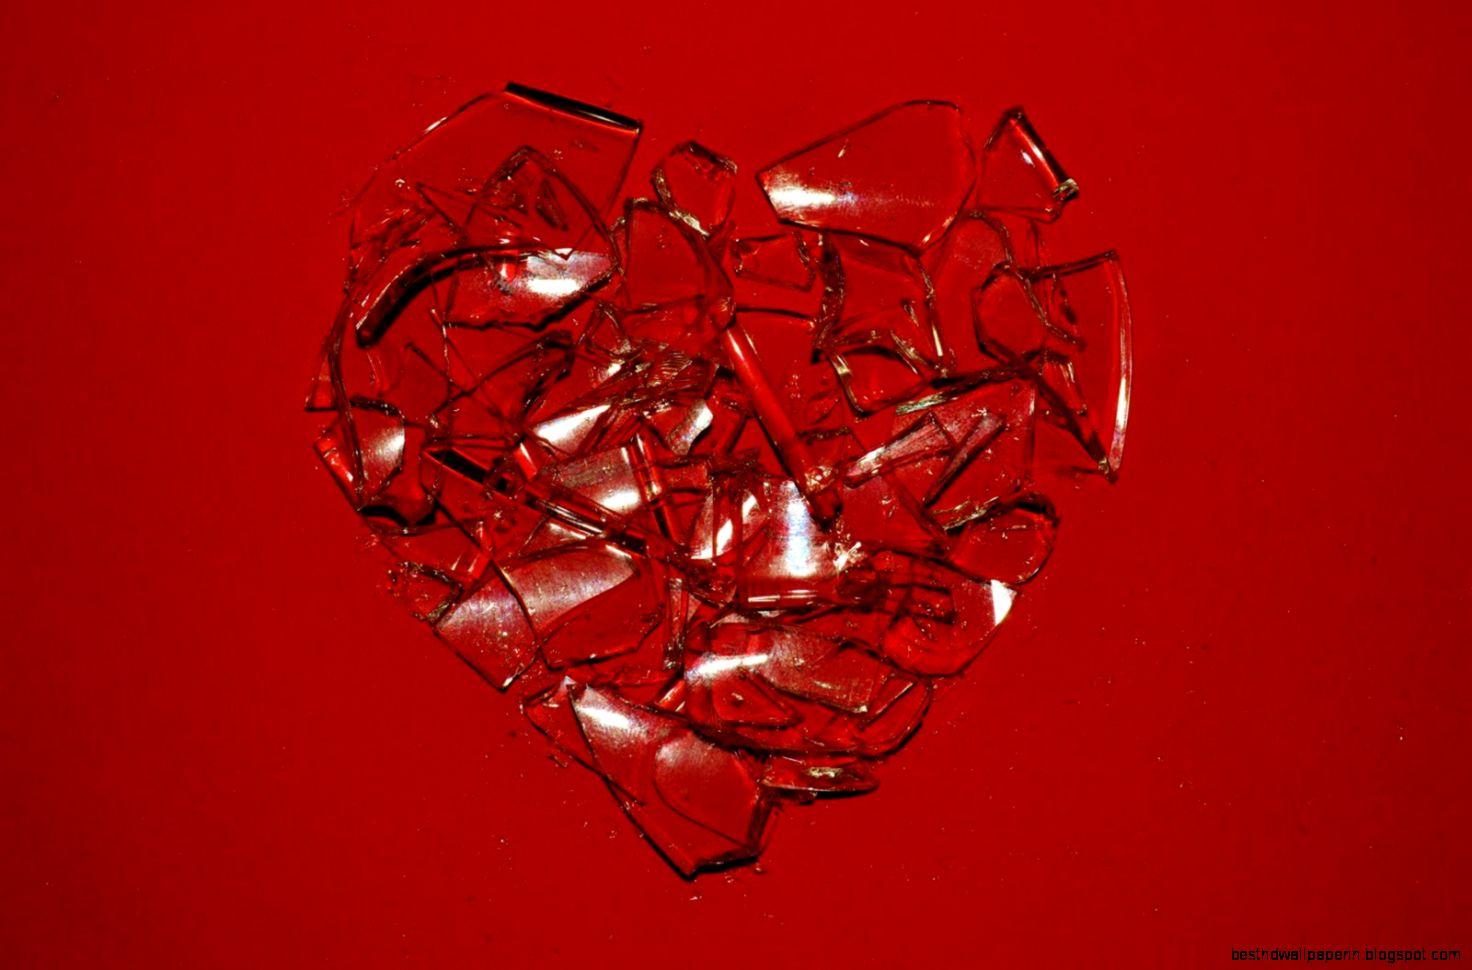 Broken Glass Heart Images